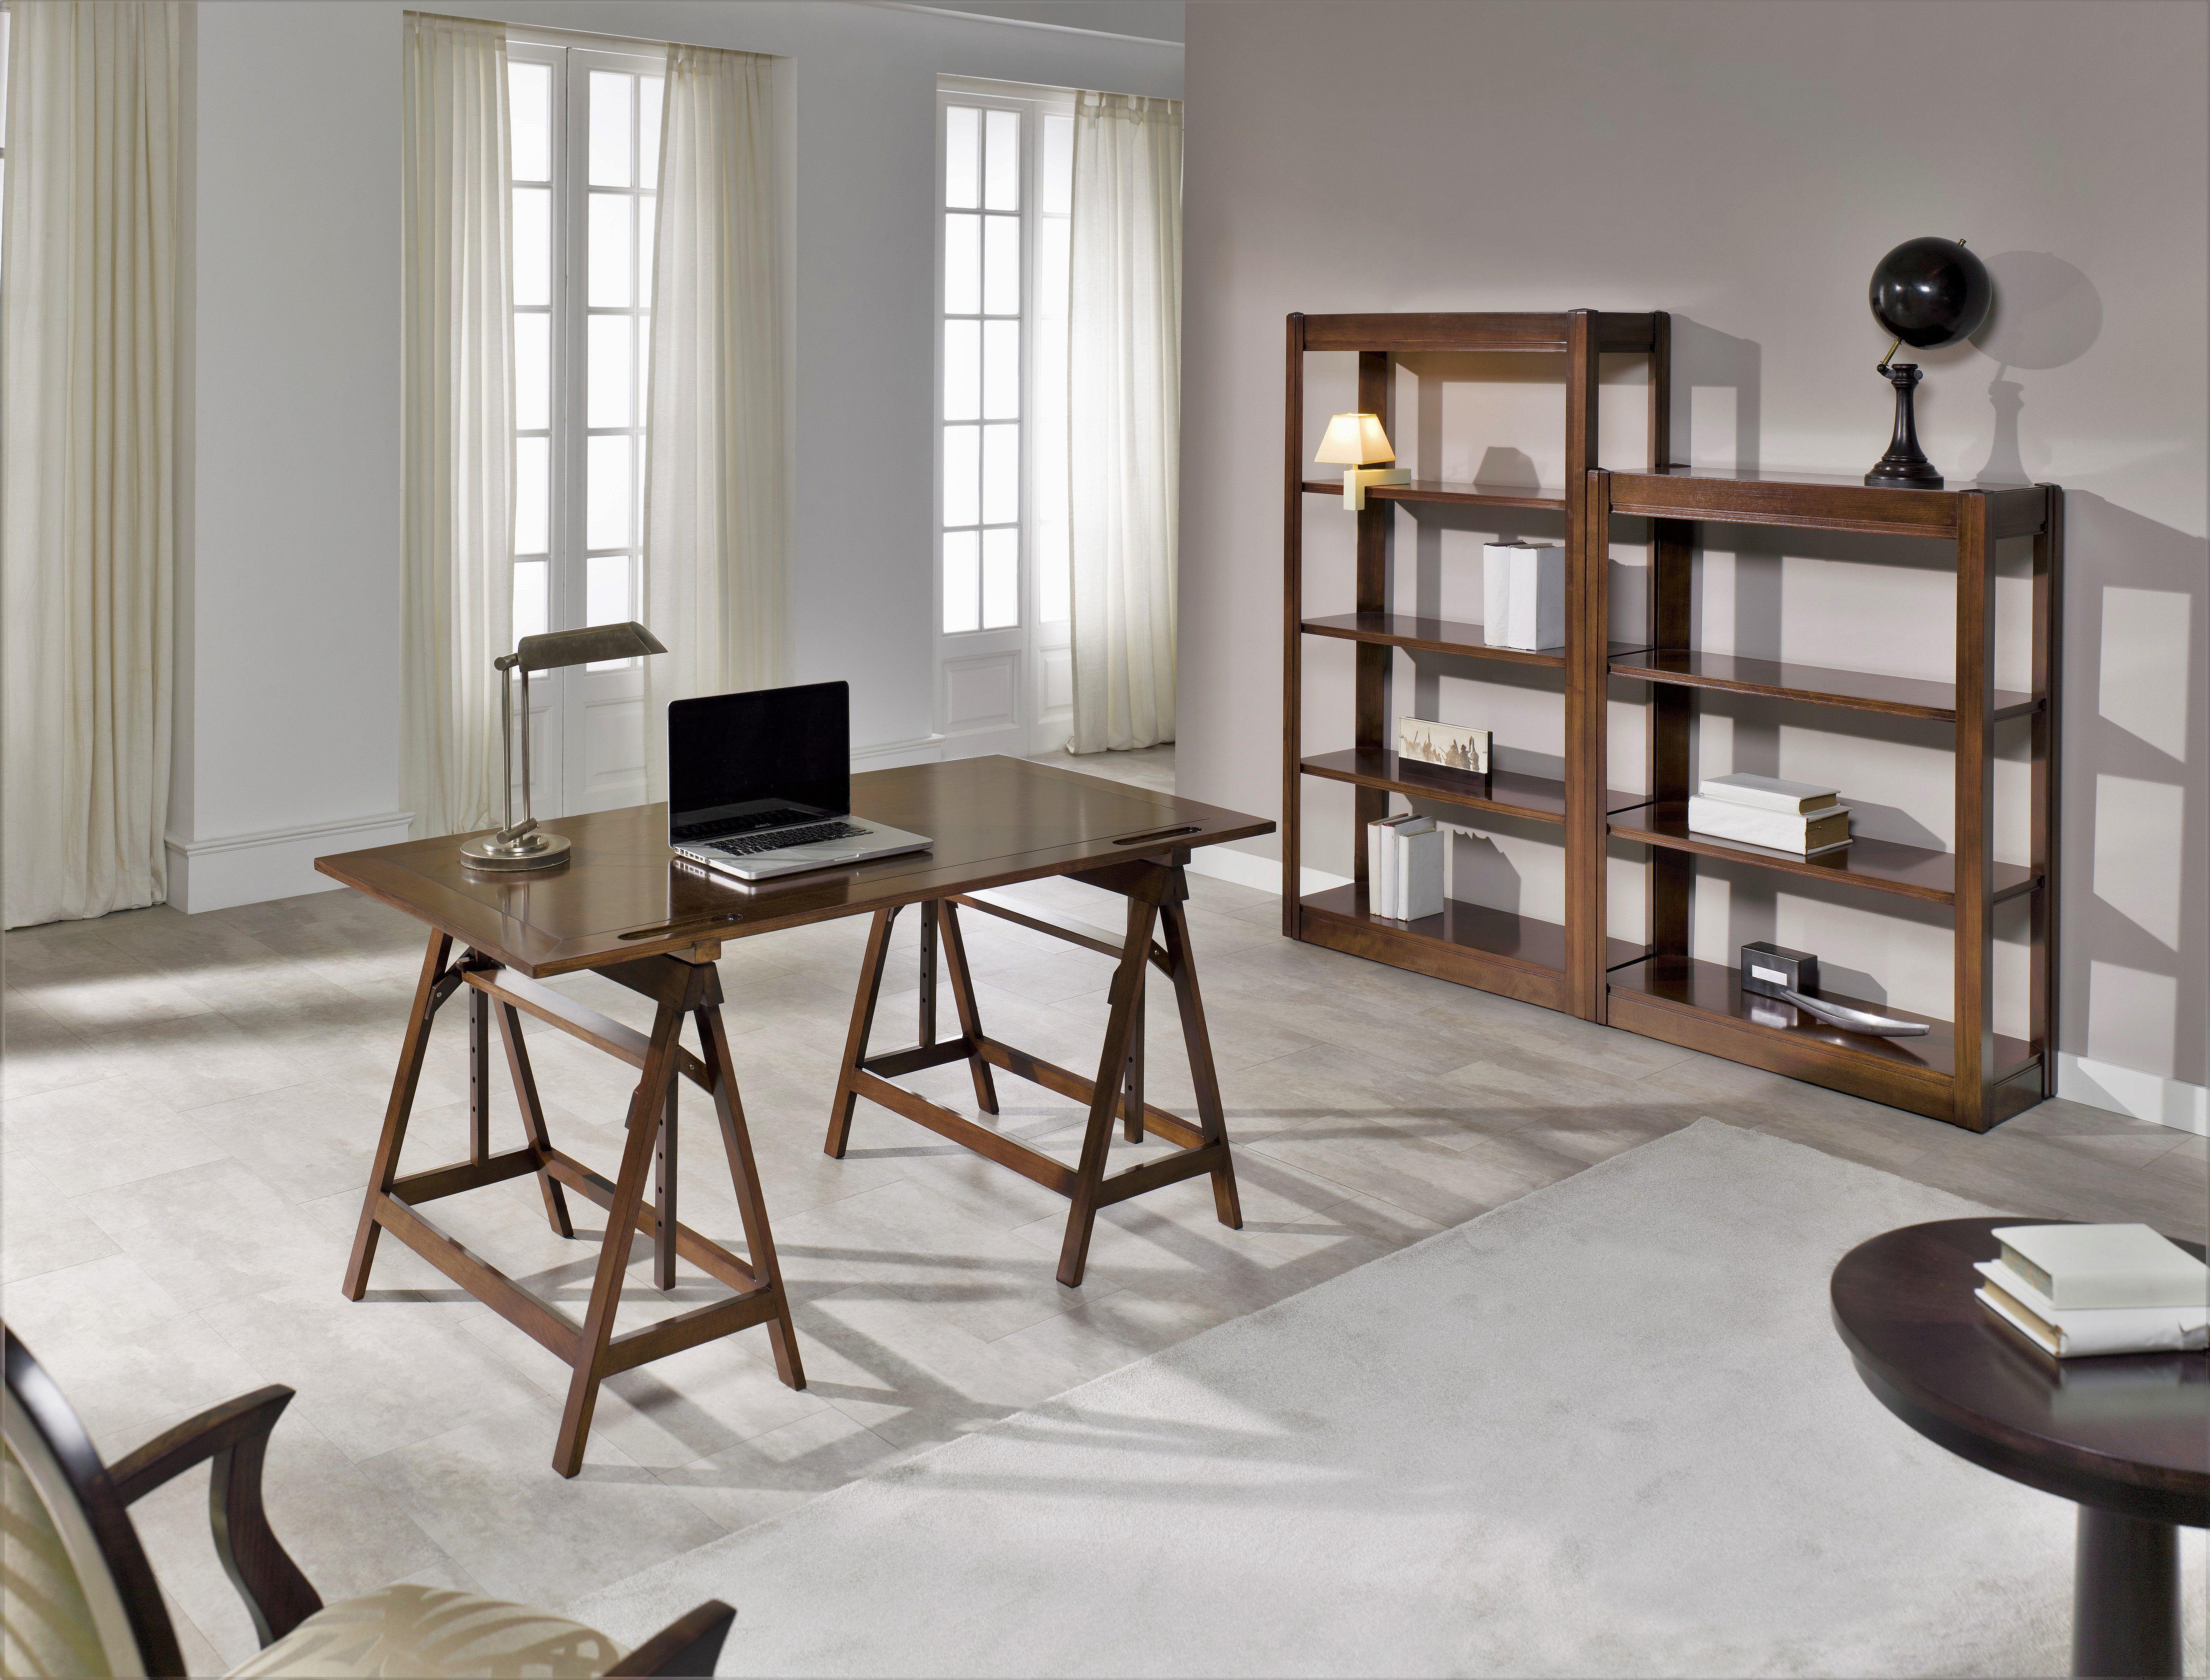 & Architect table